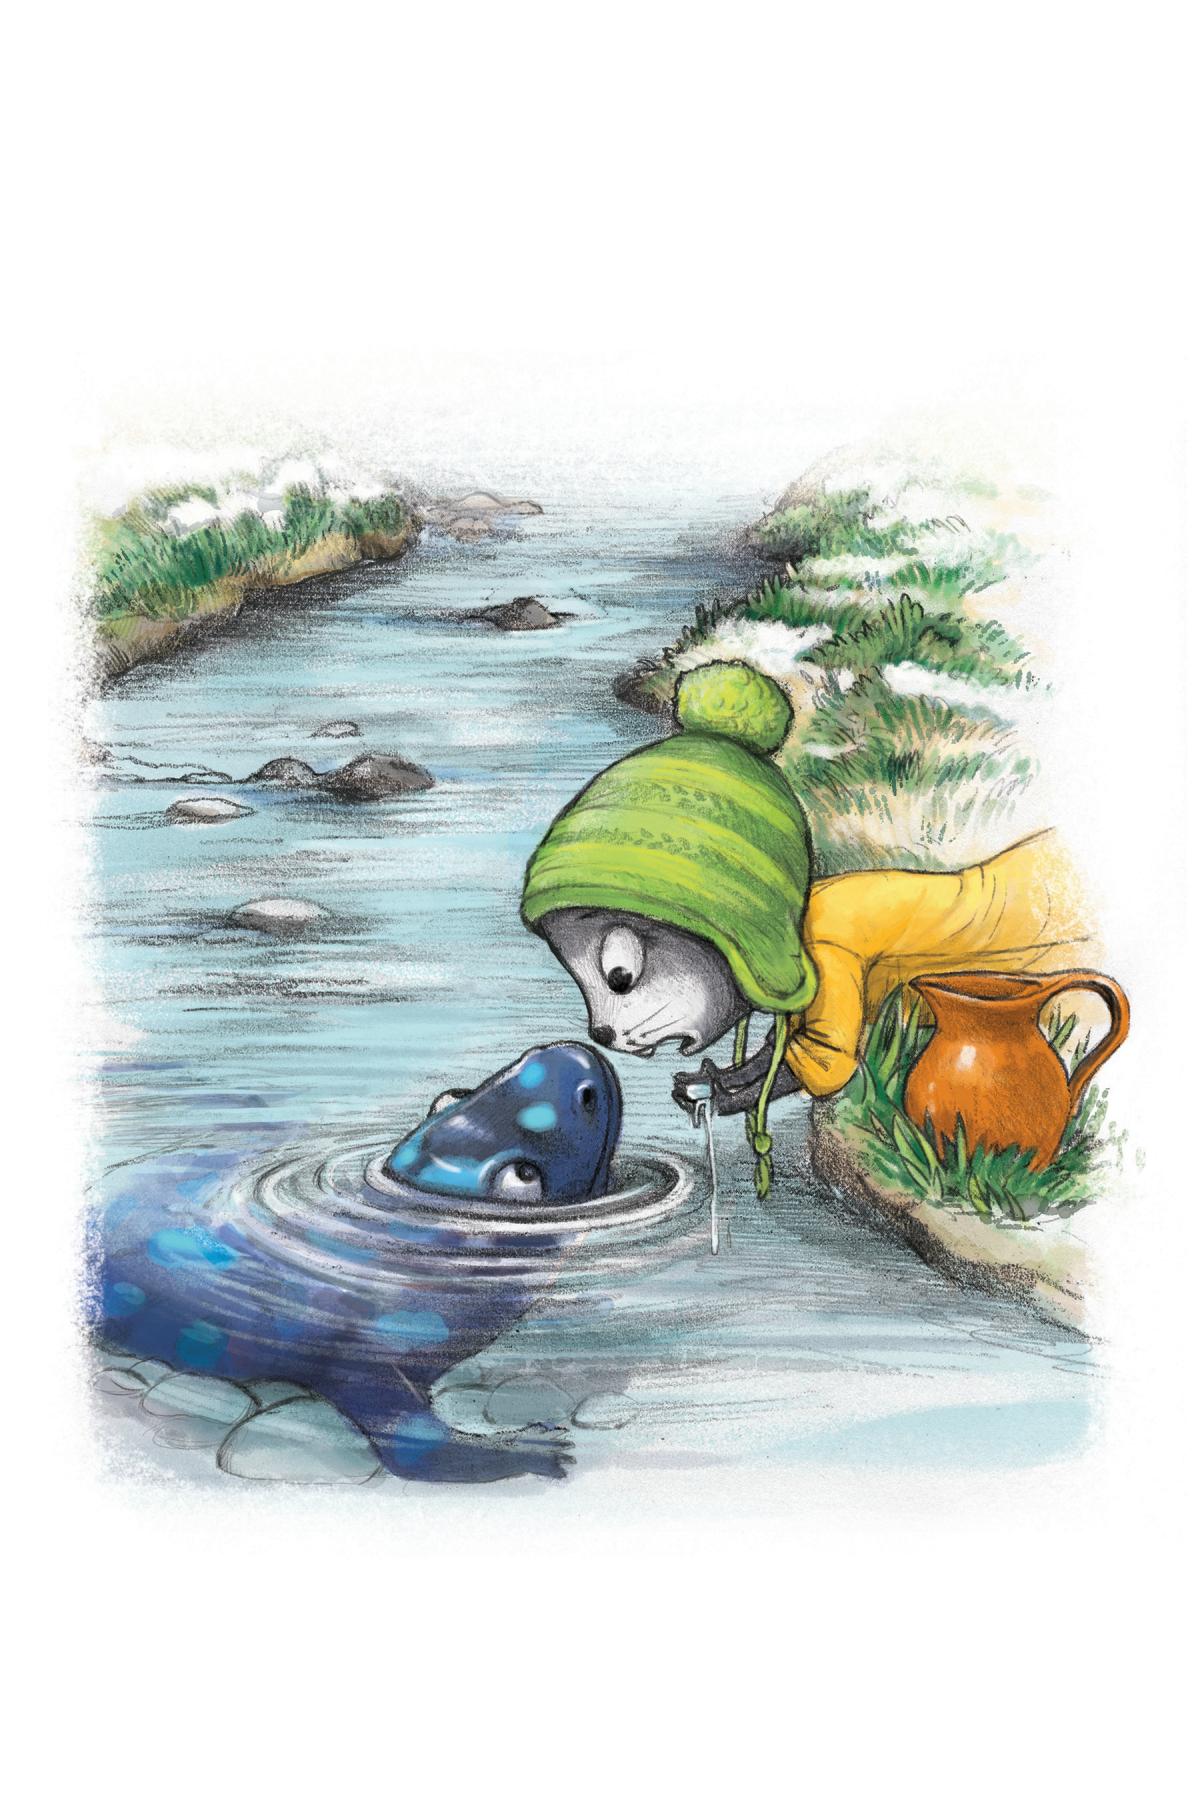 Shogg & Delon by the Creek